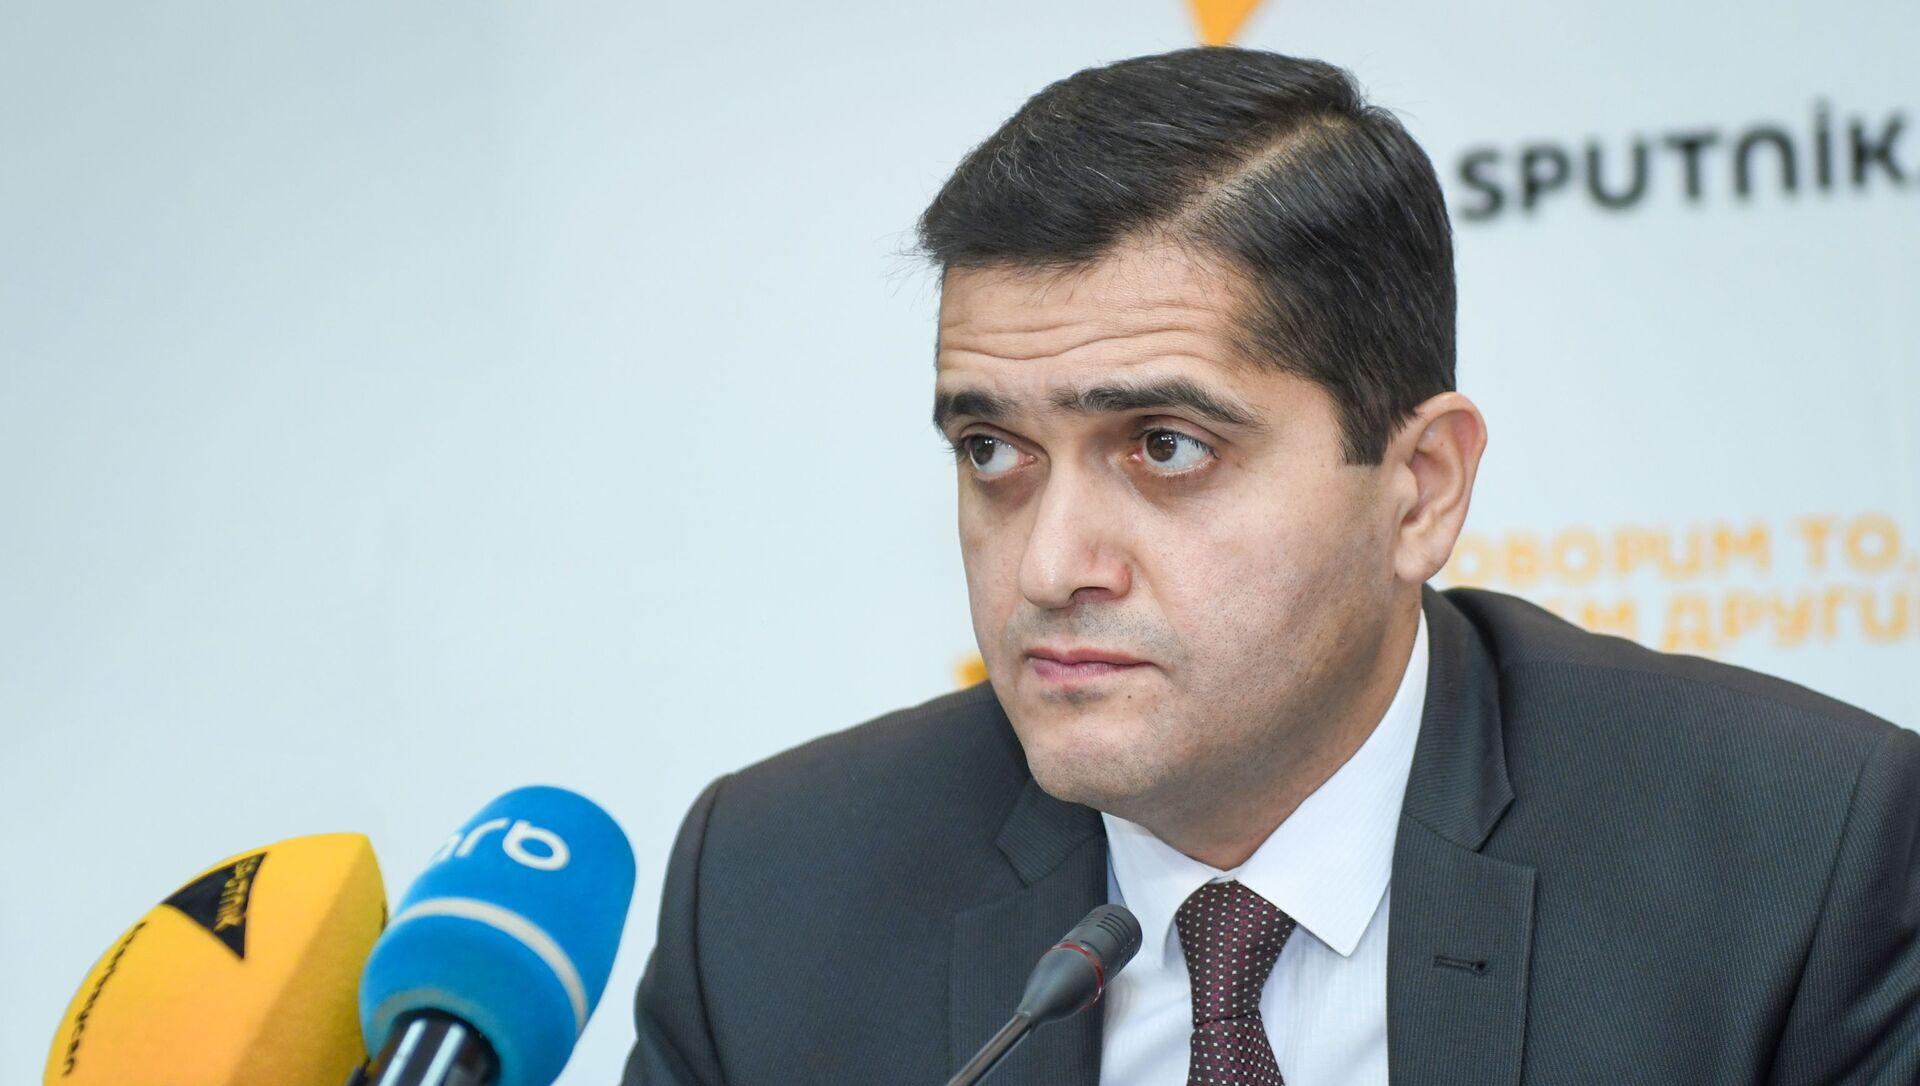 Руководитель аналитического агентства Атлас Эльхан Шахиноглу - Sputnik Азербайджан, 1920, 06.08.2021